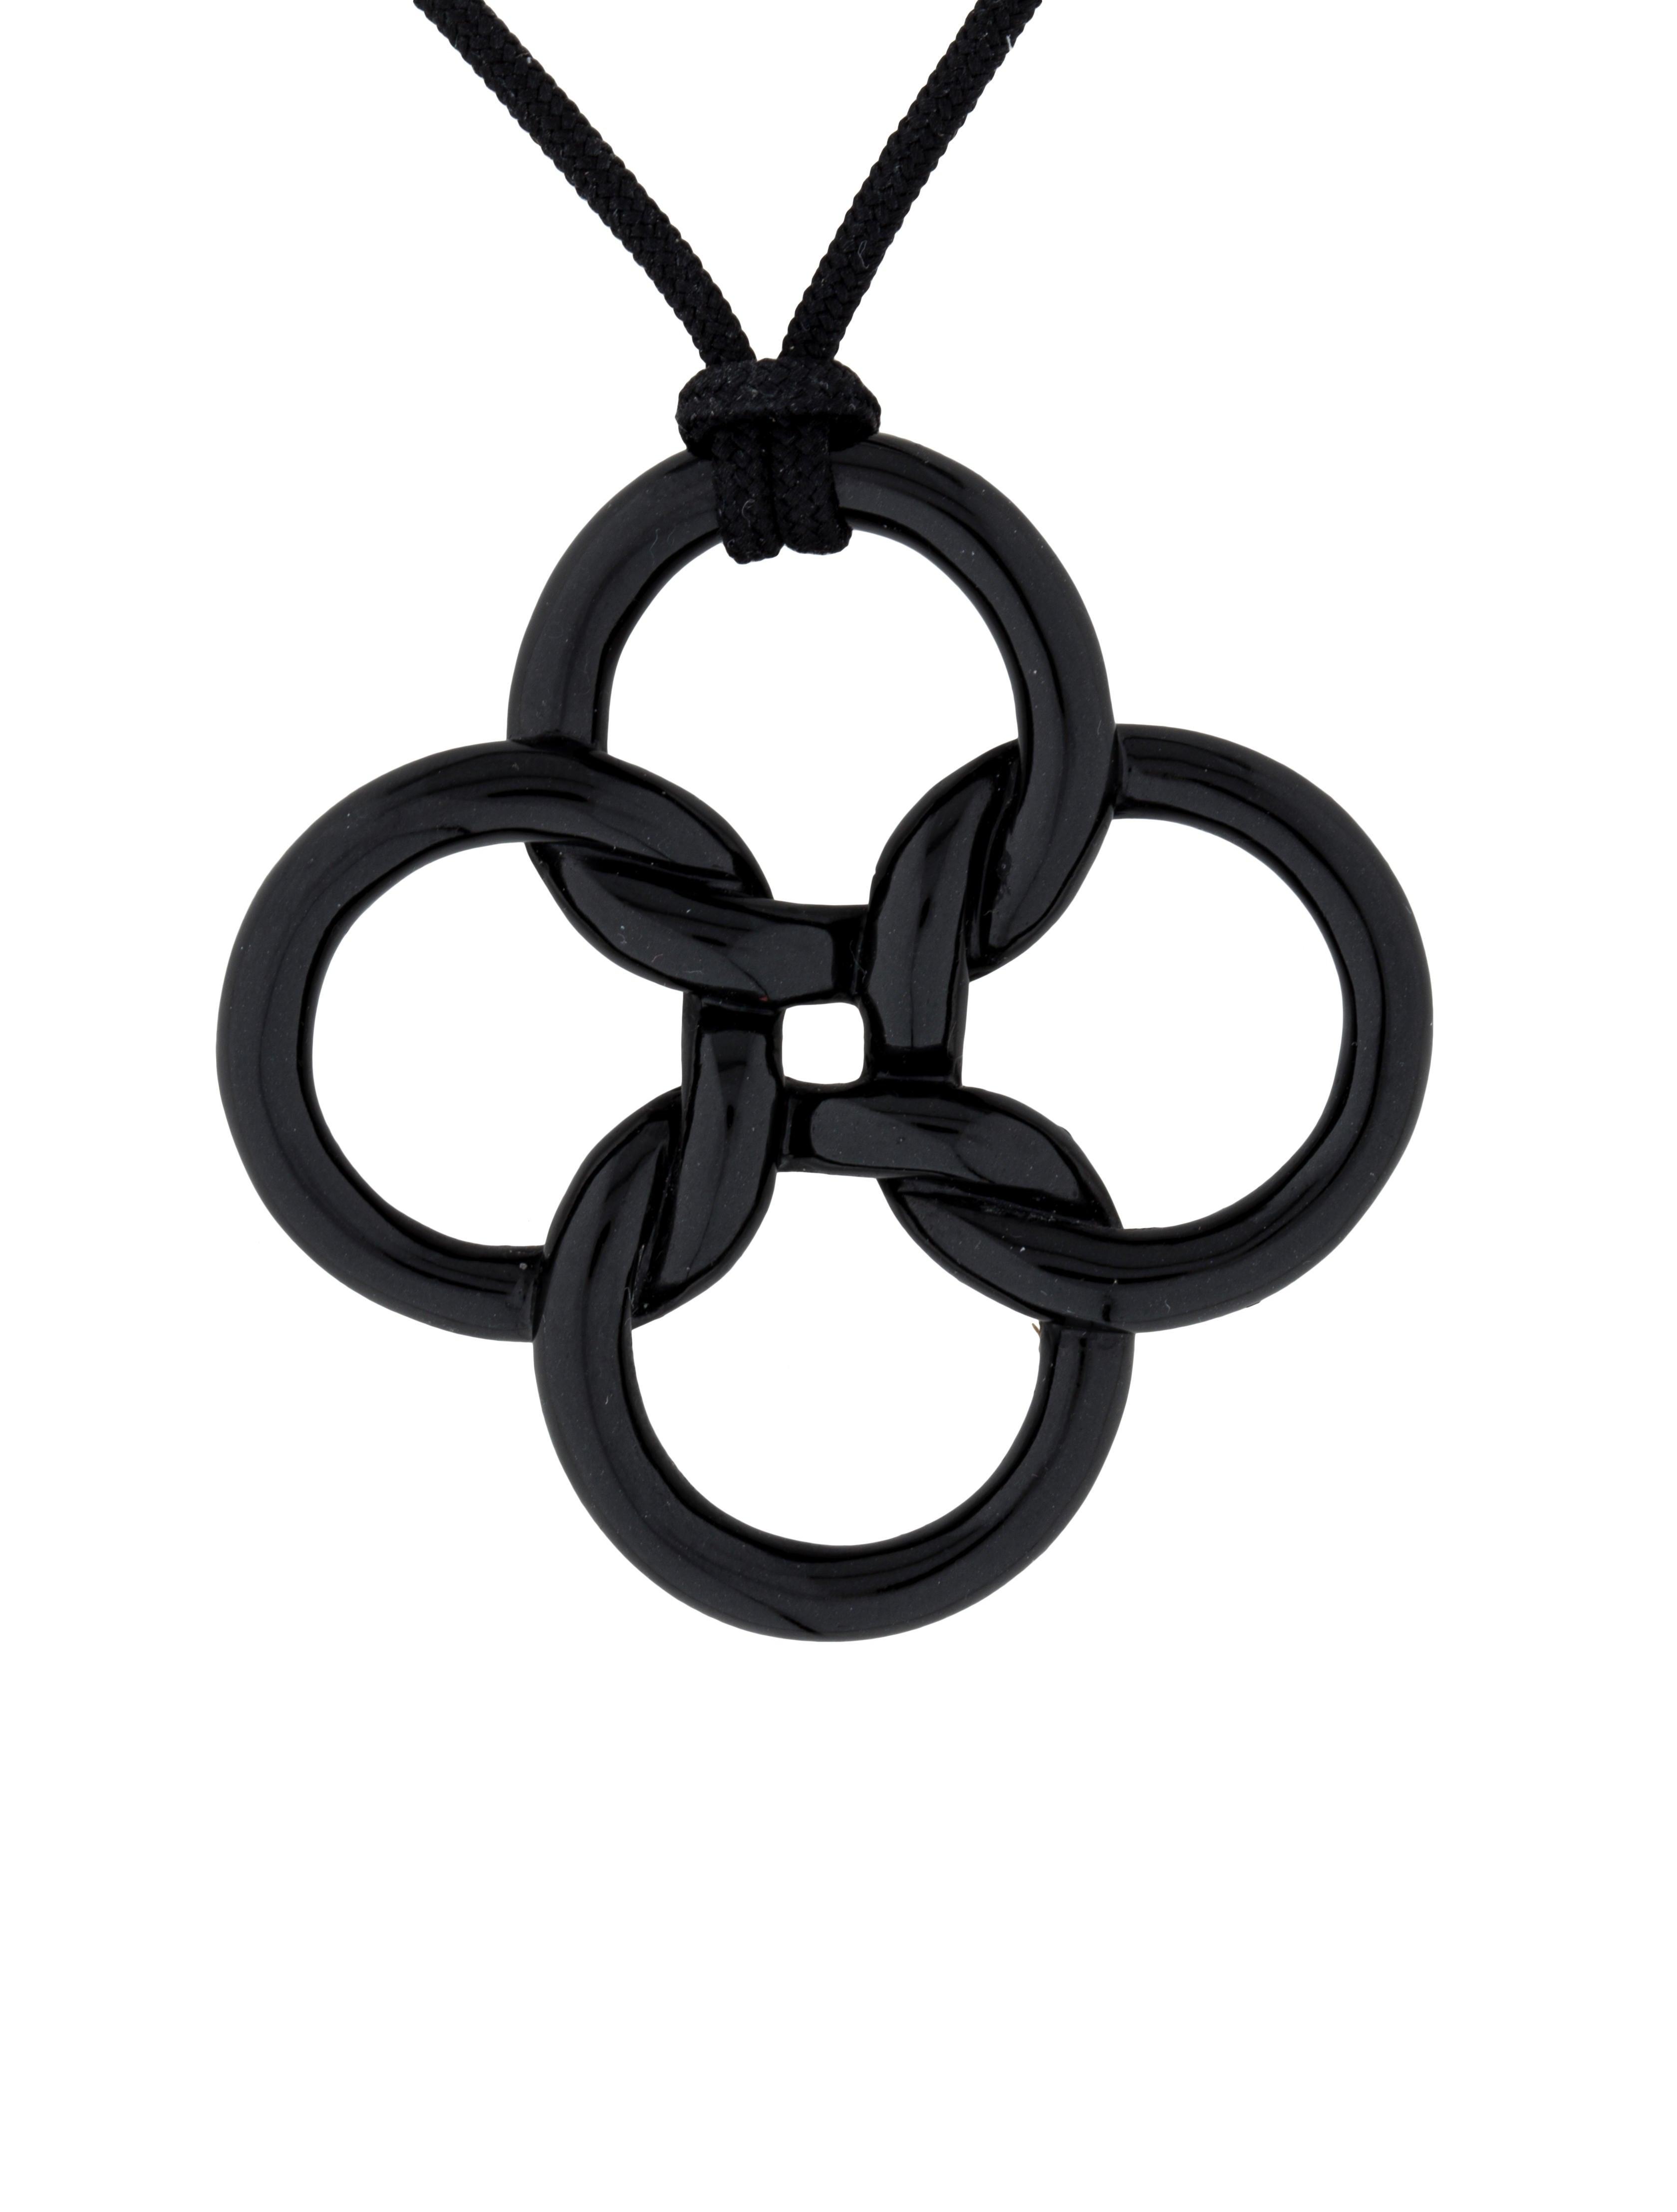 Tiffany co black jade quadrifoglio pendant necklace necklaces black jade quadrifoglio pendant necklace mozeypictures Gallery